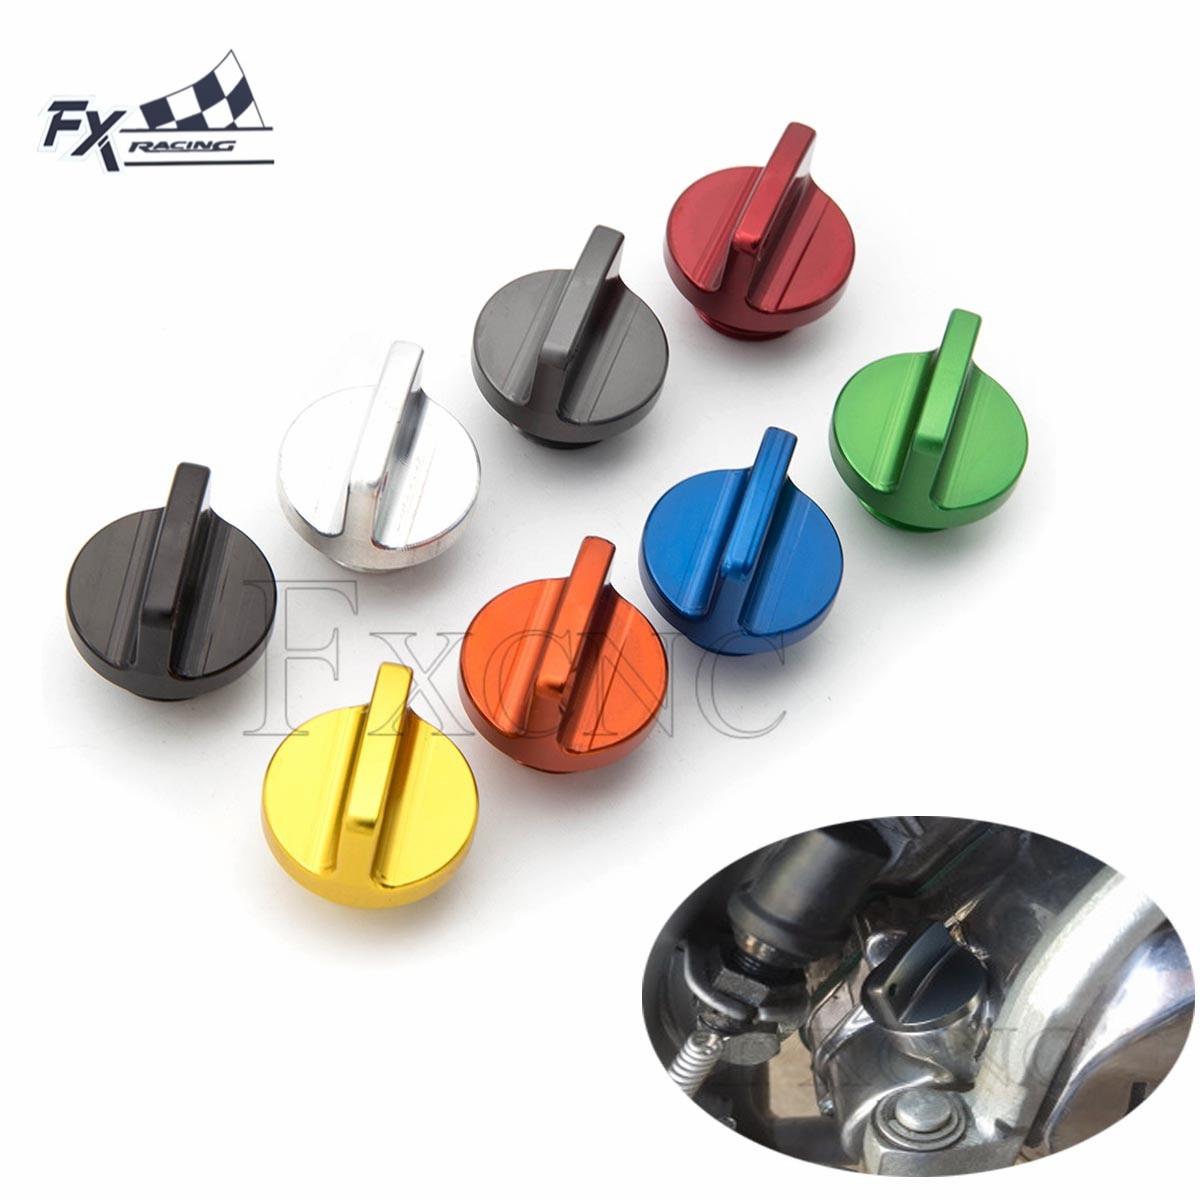 M20*2.5mm Oil Filler Cap Plug For Honda CR CRF 125R 150R 250R 450R CB600F CBF600 CBF1000 For Yamaha YZ 65 80 125/X 250/X YZ250F